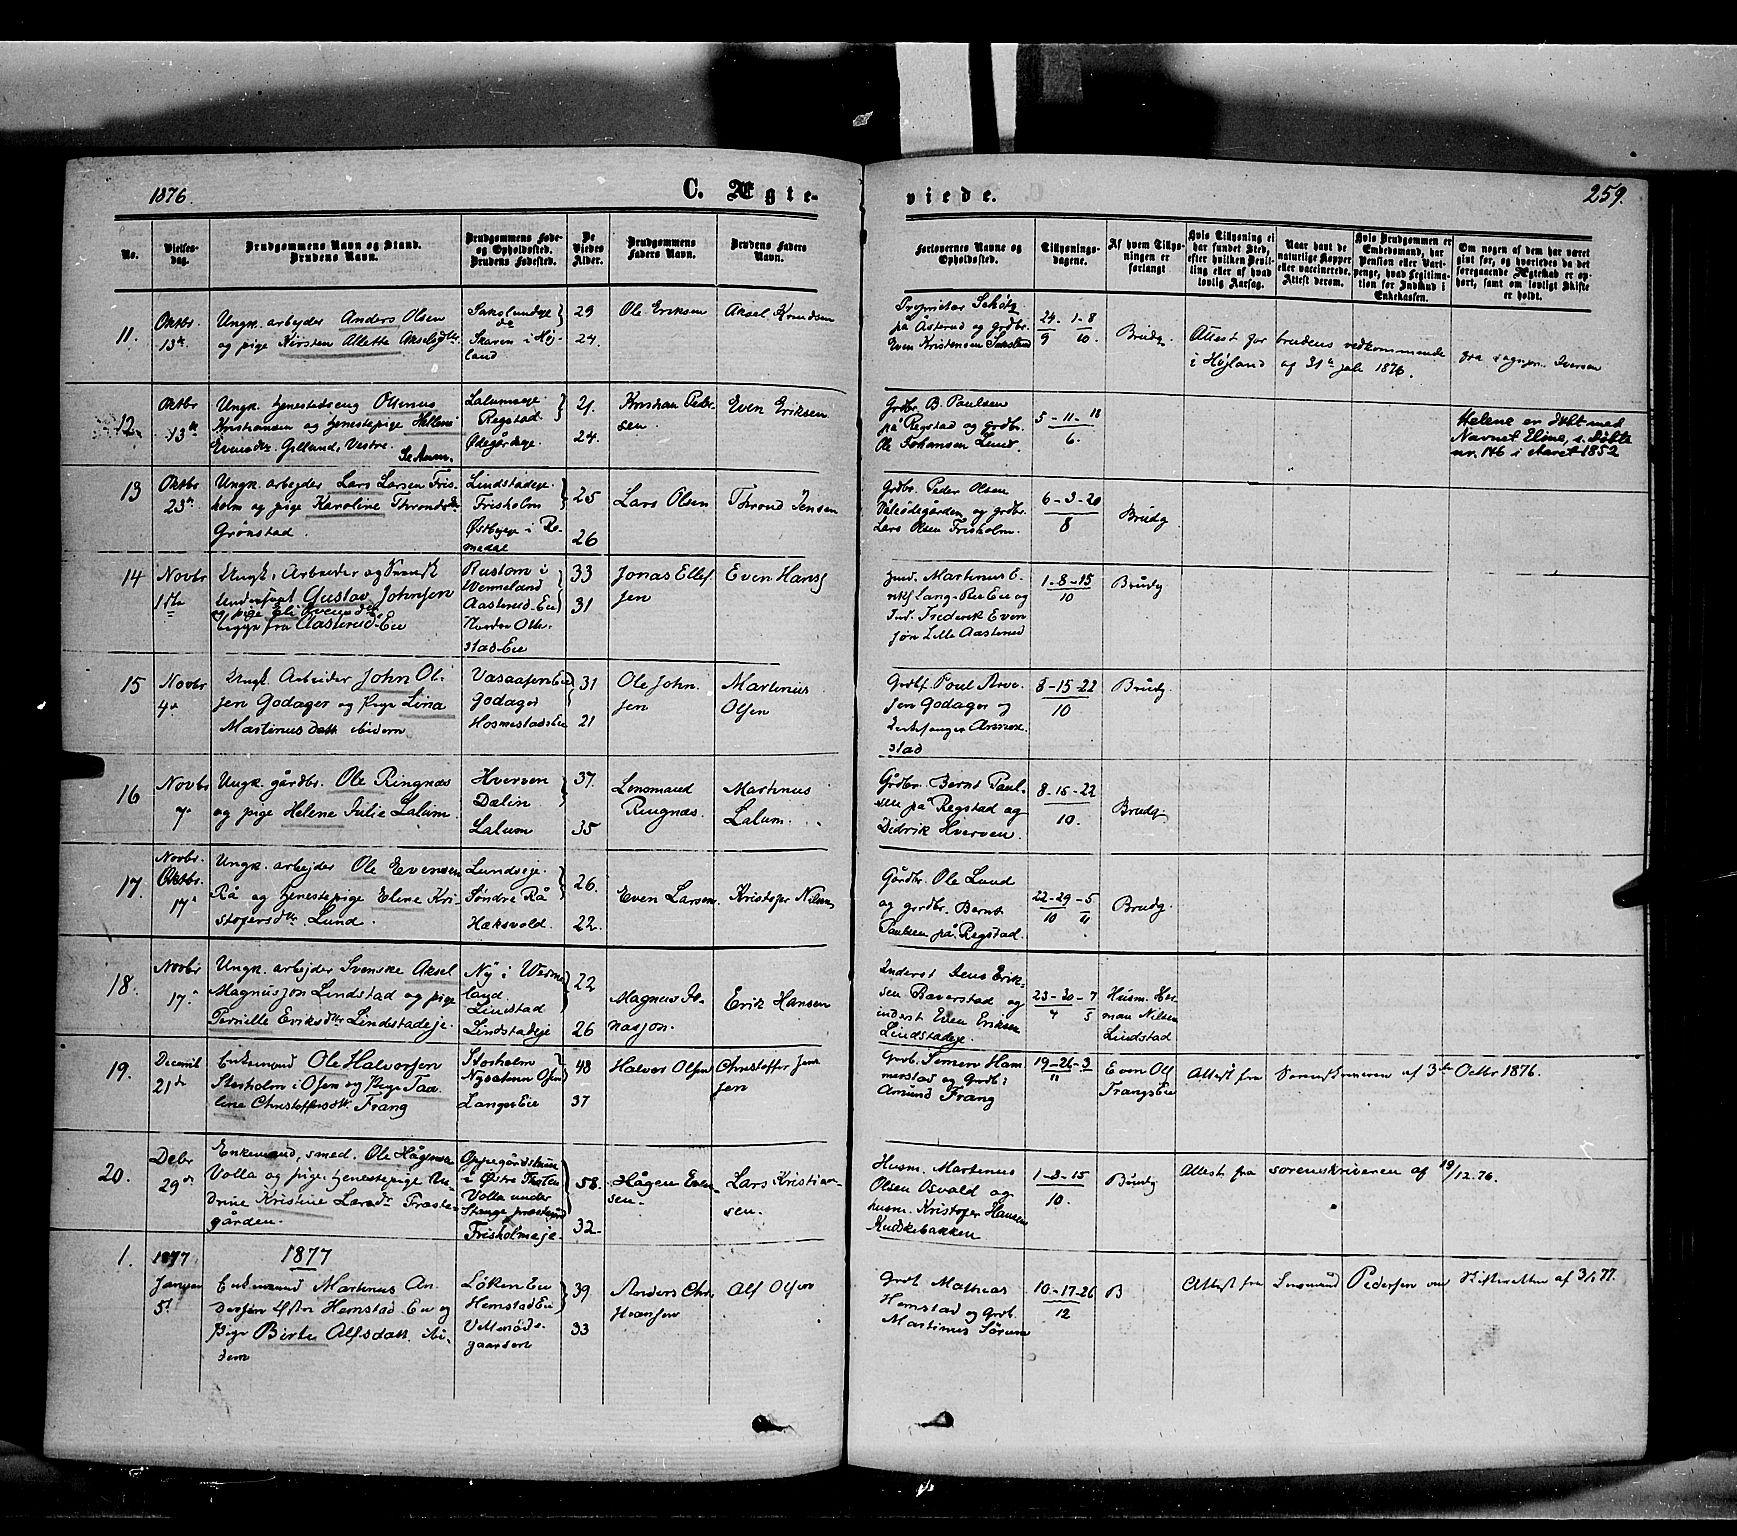 SAH, Stange prestekontor, K/L0013: Ministerialbok nr. 13, 1862-1879, s. 259